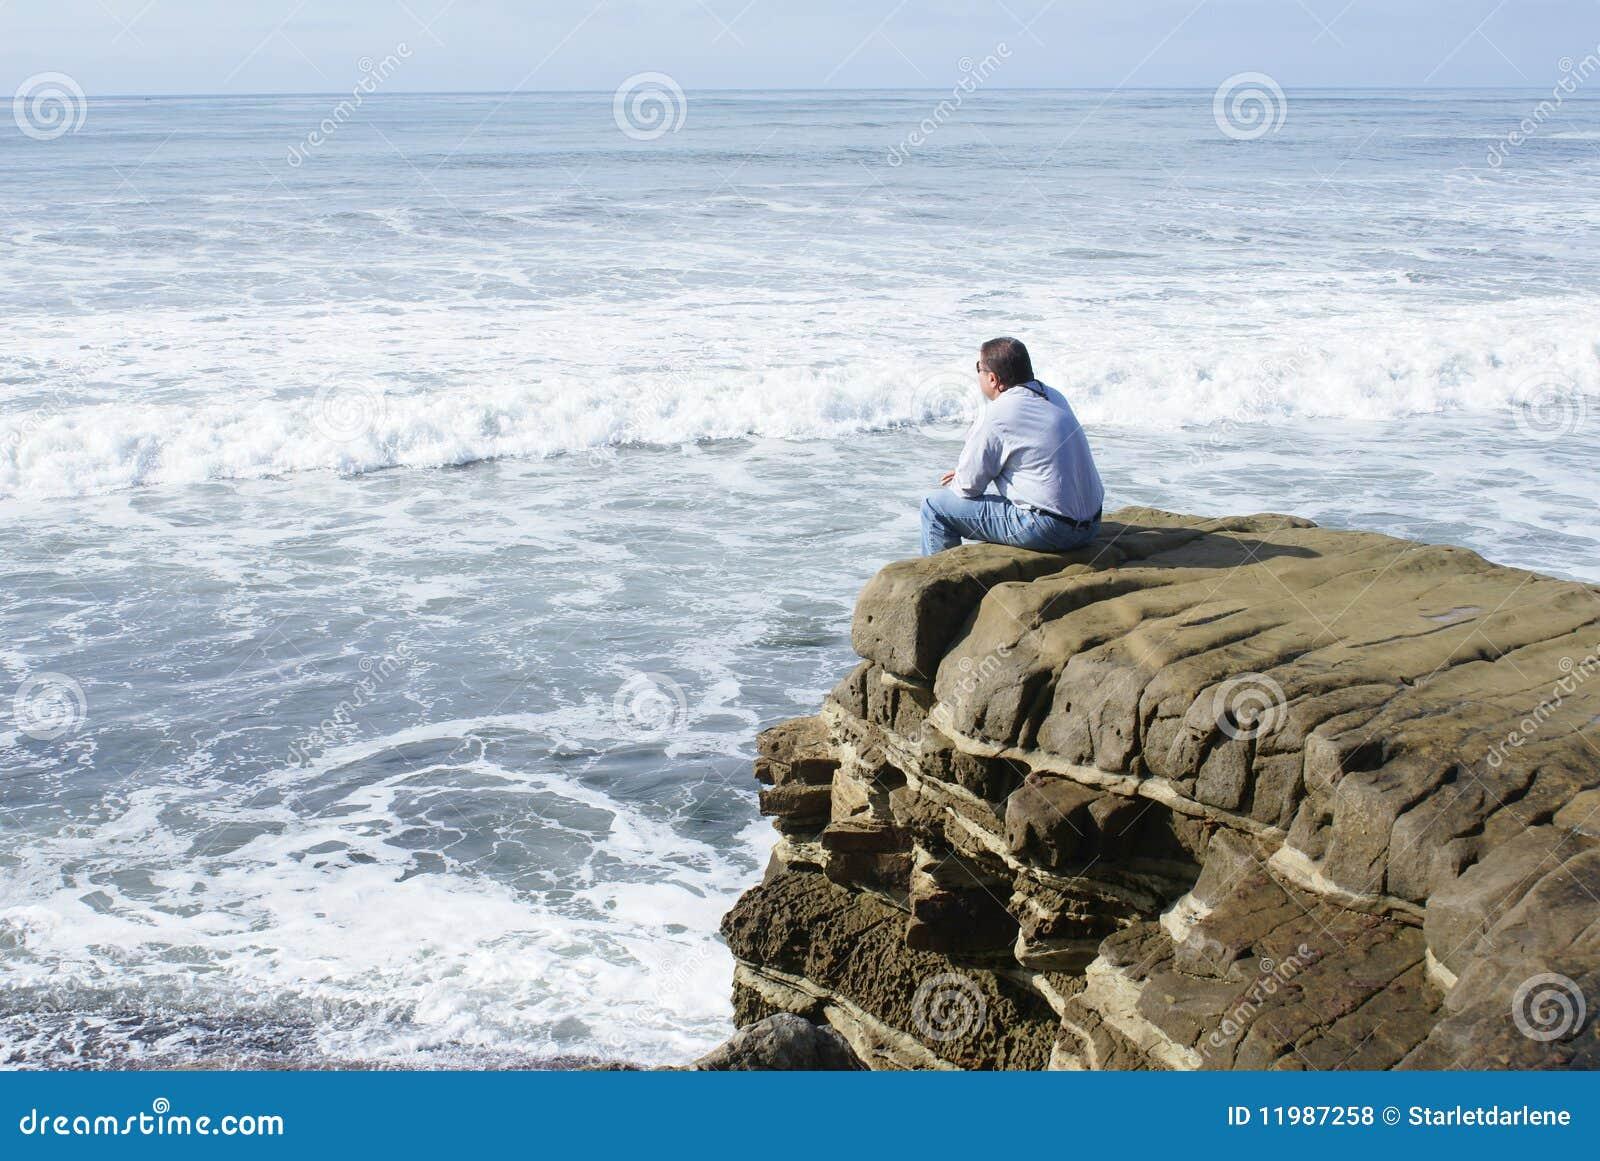 Man Alone Meditating or Thinking